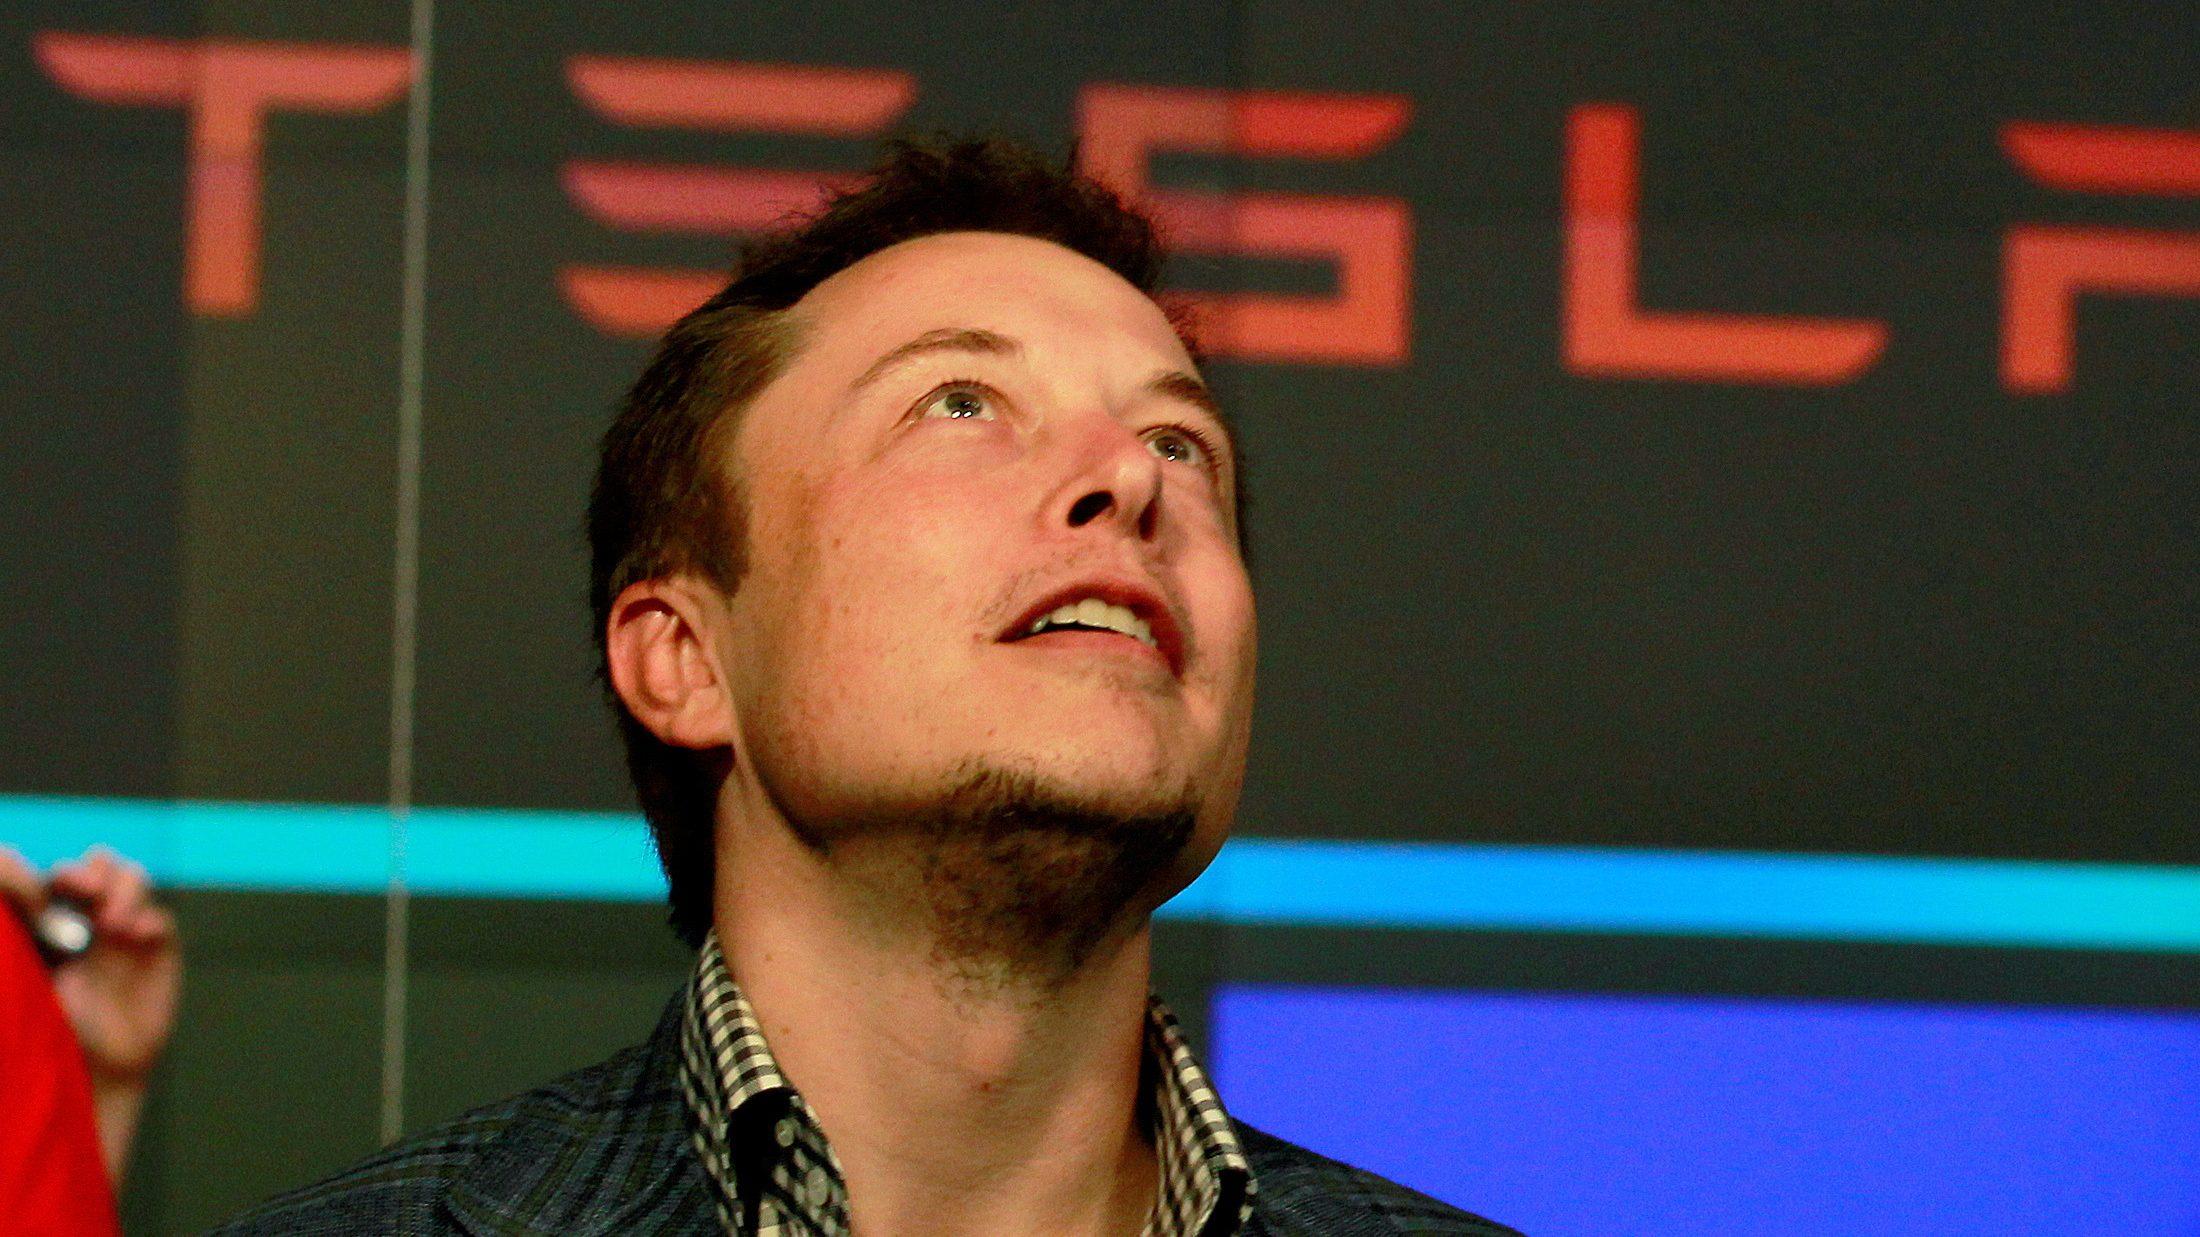 FILE PHOTO: Tesla's CEO, Elon Musk